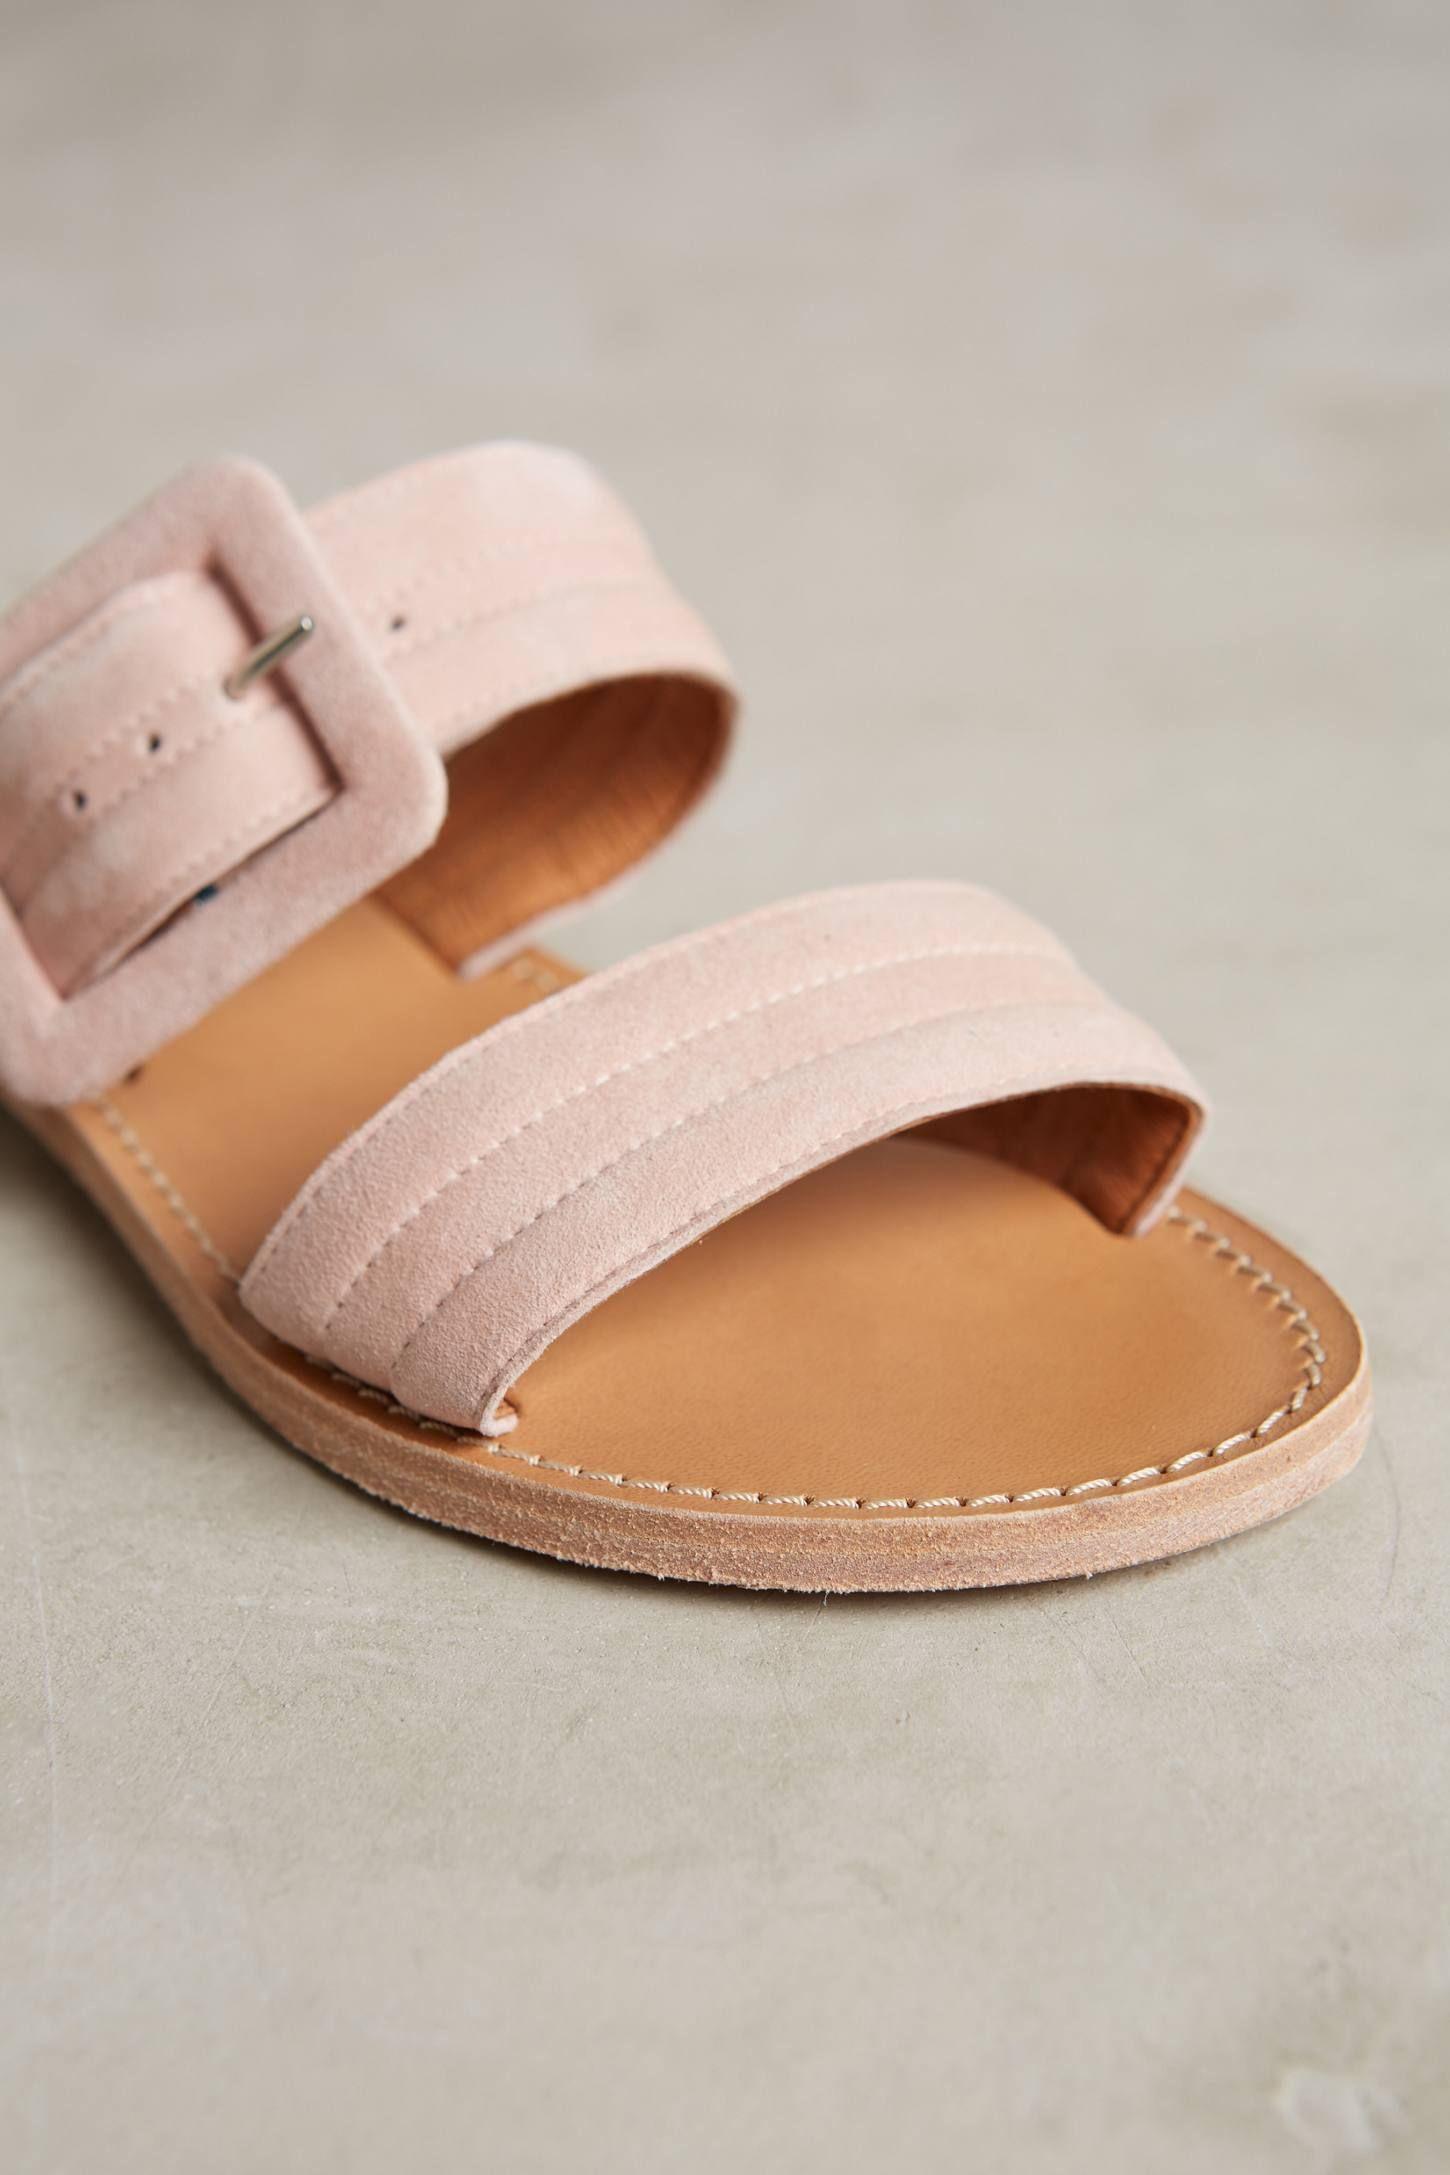 fe965bf39336 Slide View  4  Morena Gabbrielli Quilted Slide Sandals